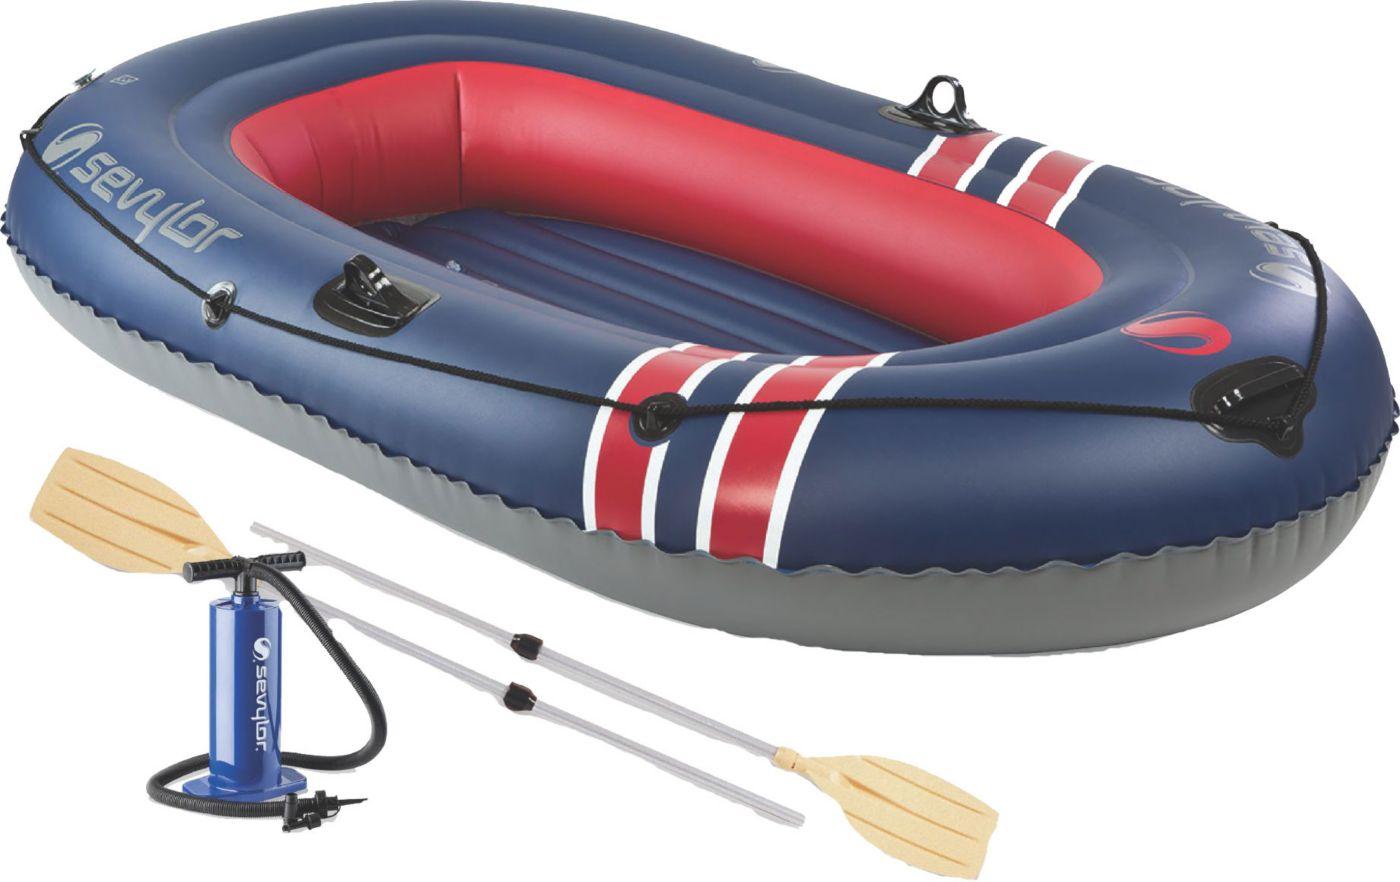 Sevylor Super Caravelle 300 Berkley Combo 3-Person Inflatable Boat